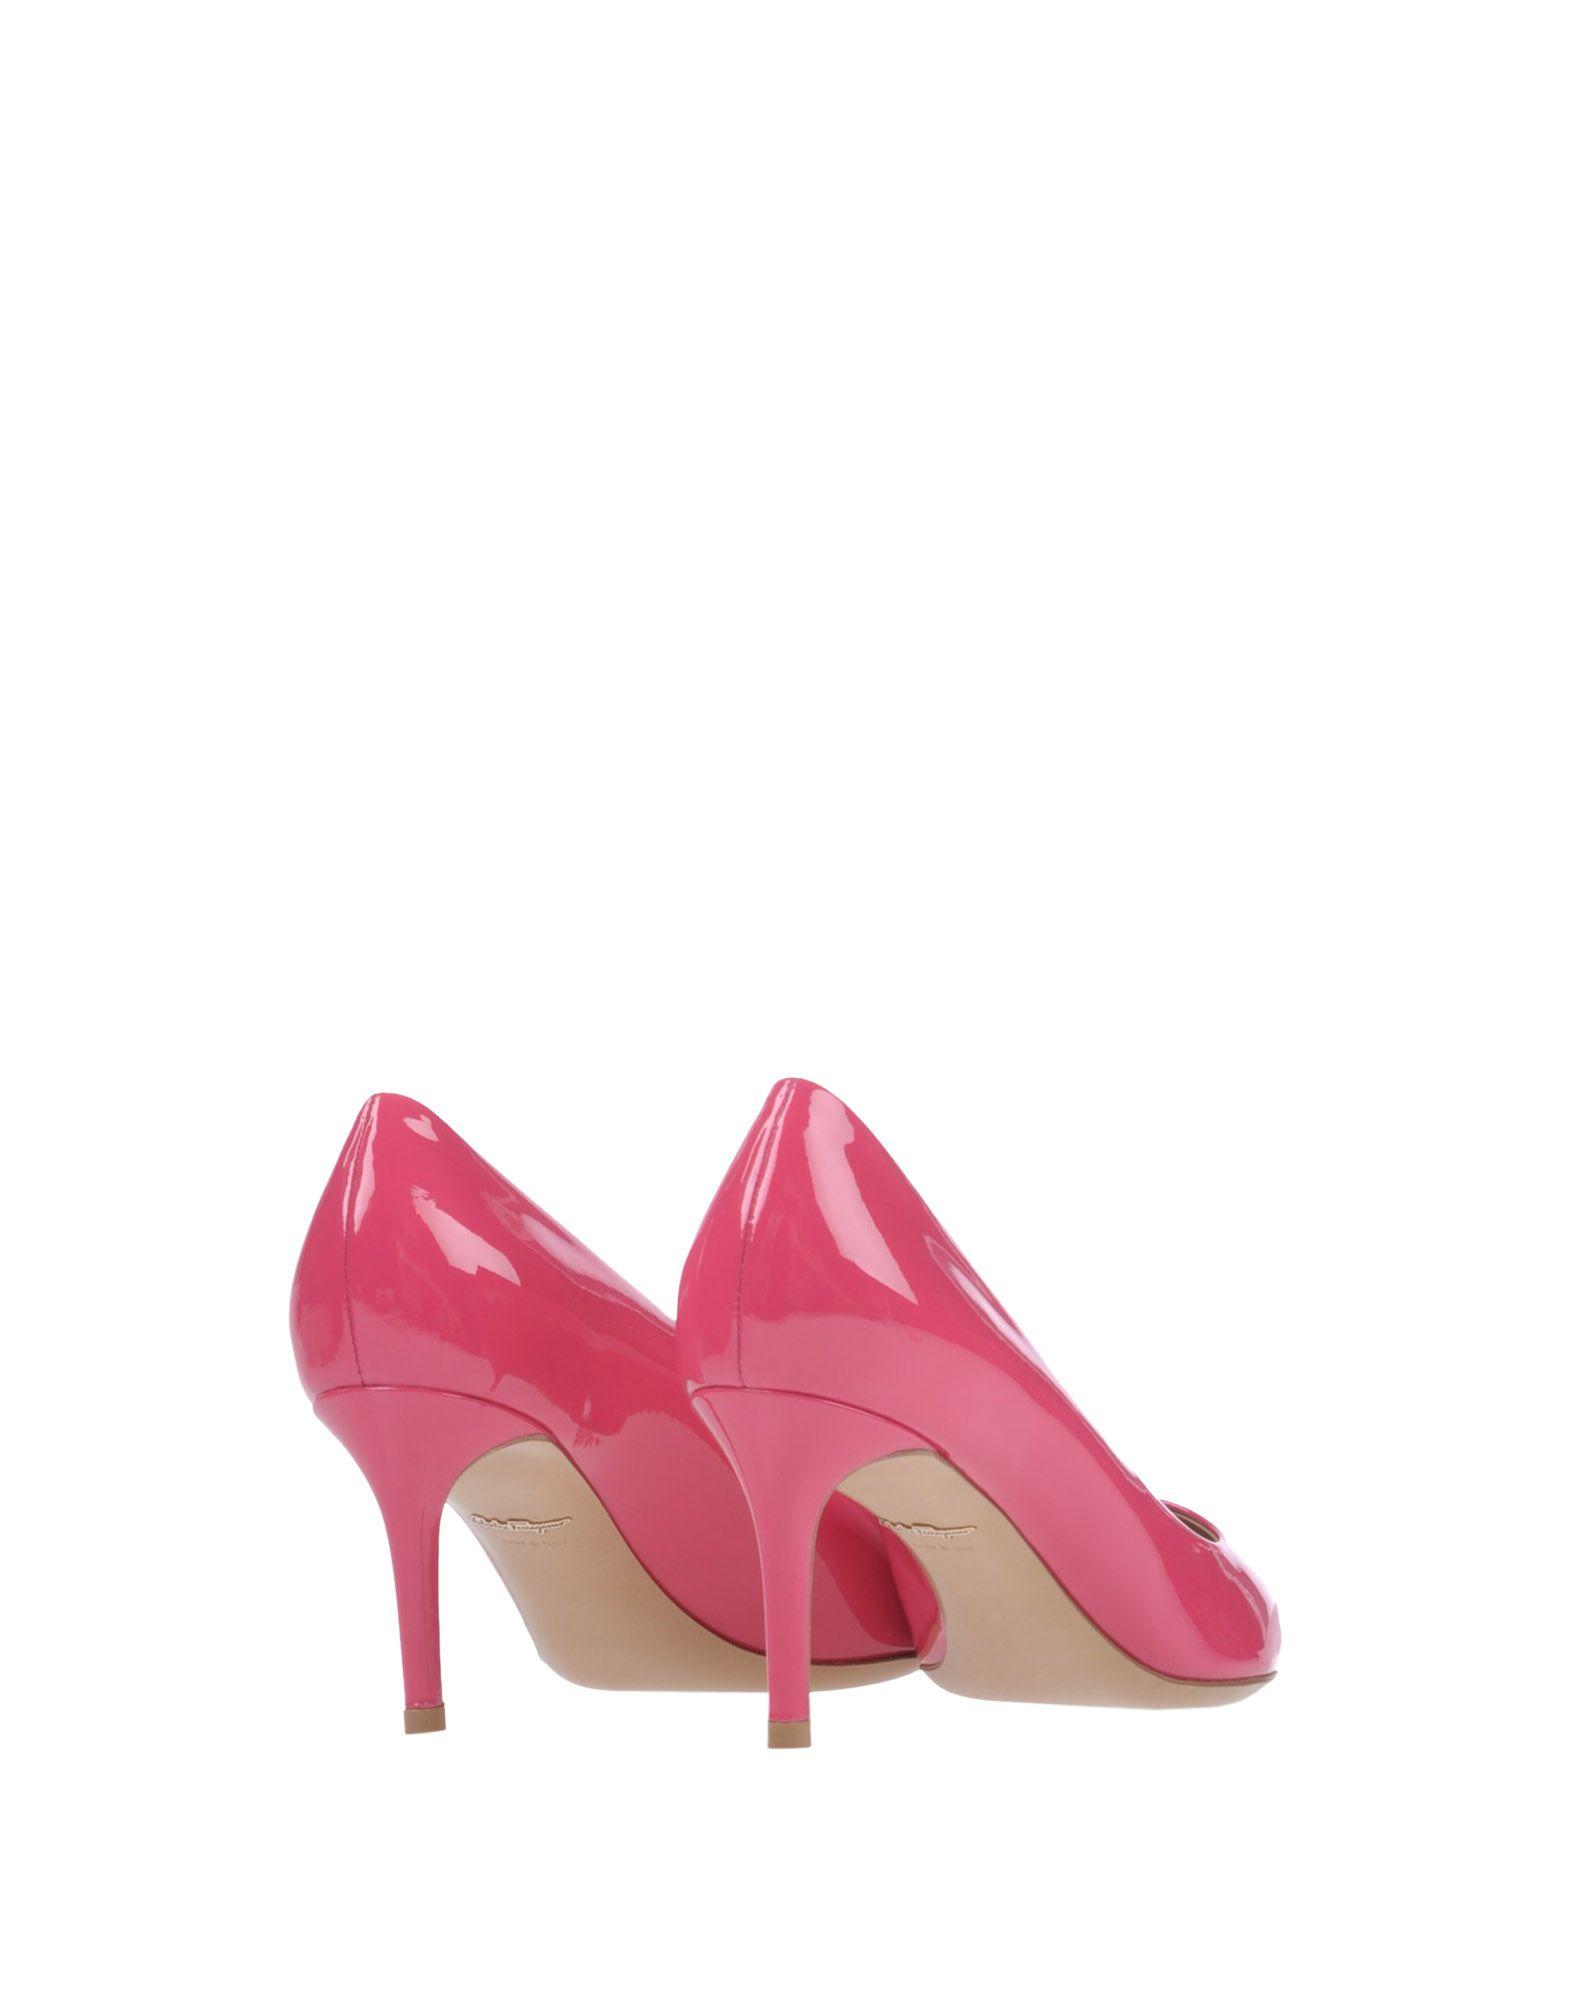 Salvatore Ferragamo Pumps Damen Damen Damen  11381119SU Beliebte Schuhe 10cef9